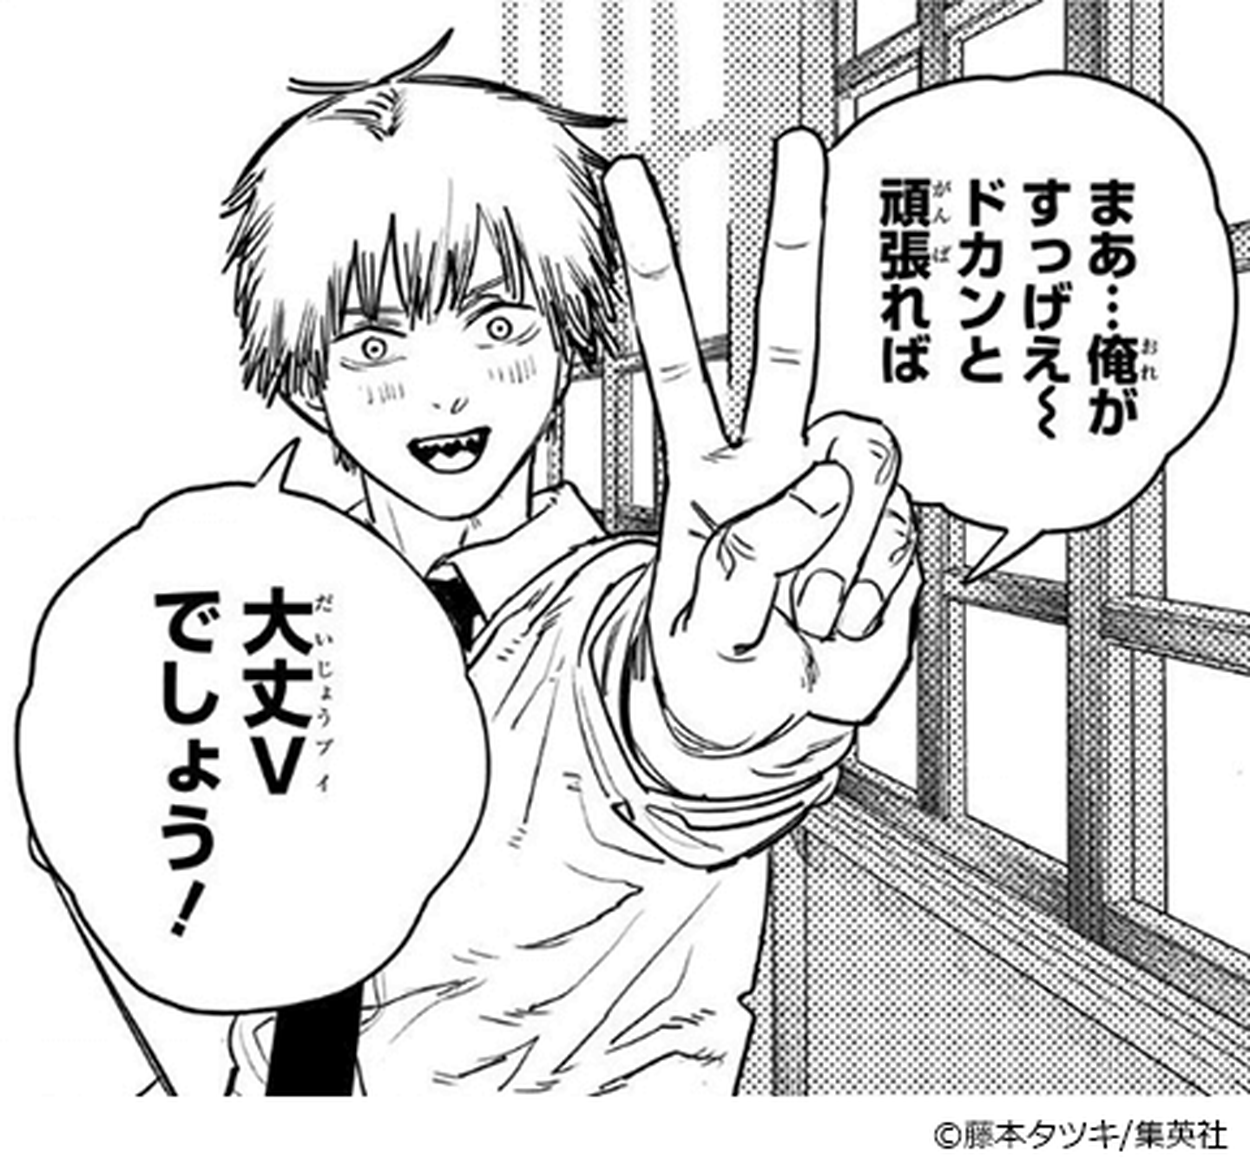 denji 1 - 【チェンソーマン】4話 感想…パワーちゃん可愛い! デンジの煩悩ヤバすぎww